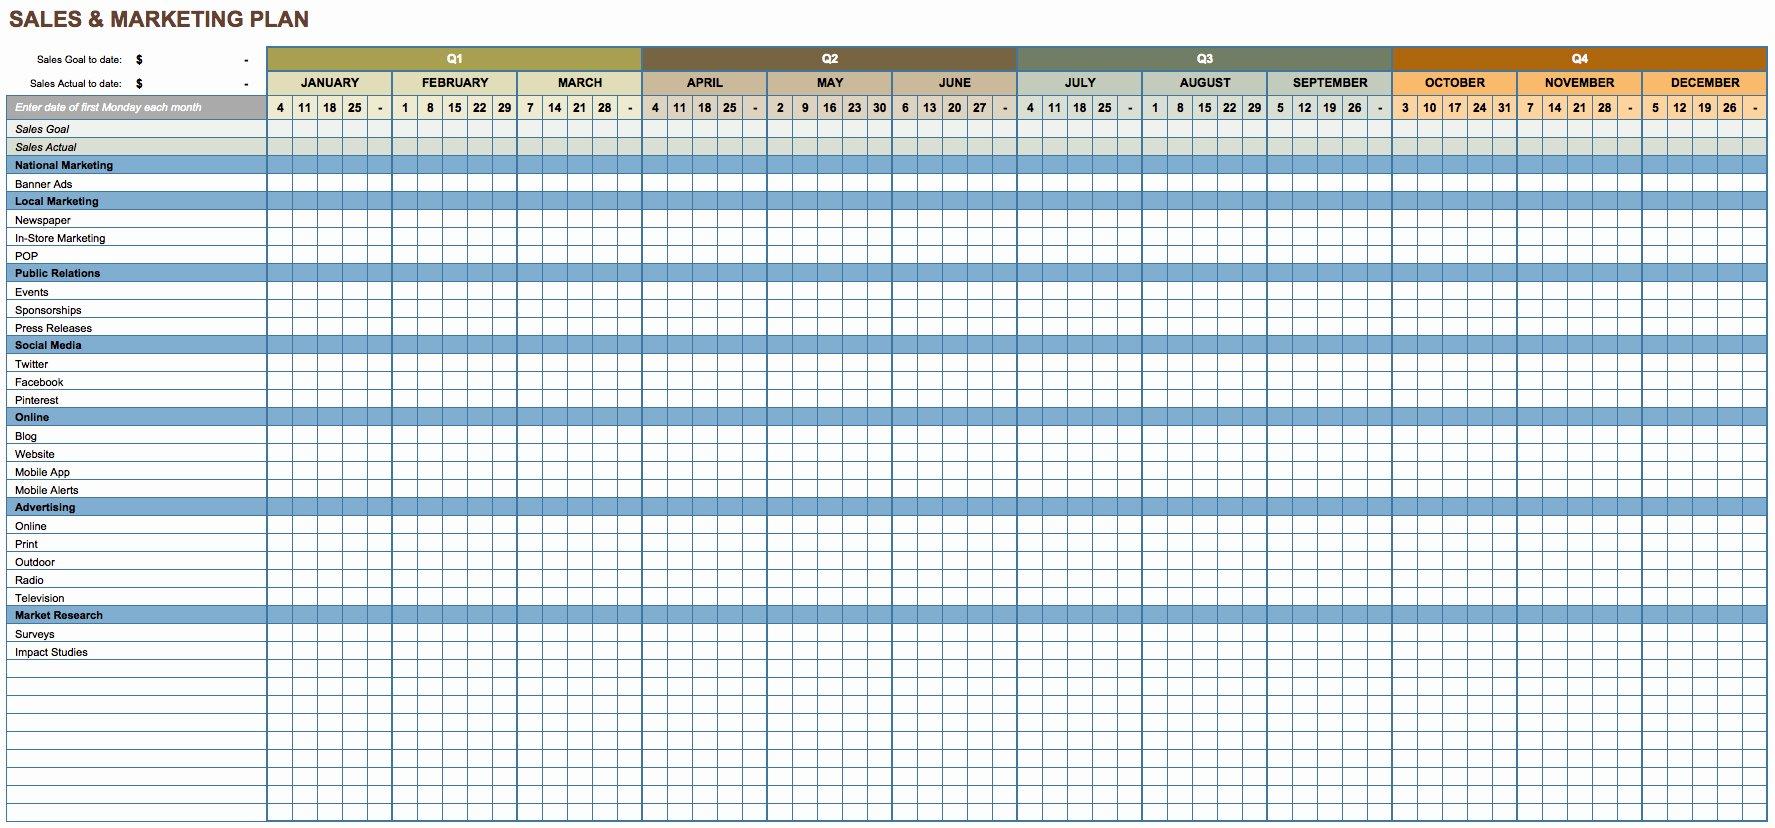 Sales Calling Plan Template Fresh Free Marketing Plan Templates for Excel Smartsheet